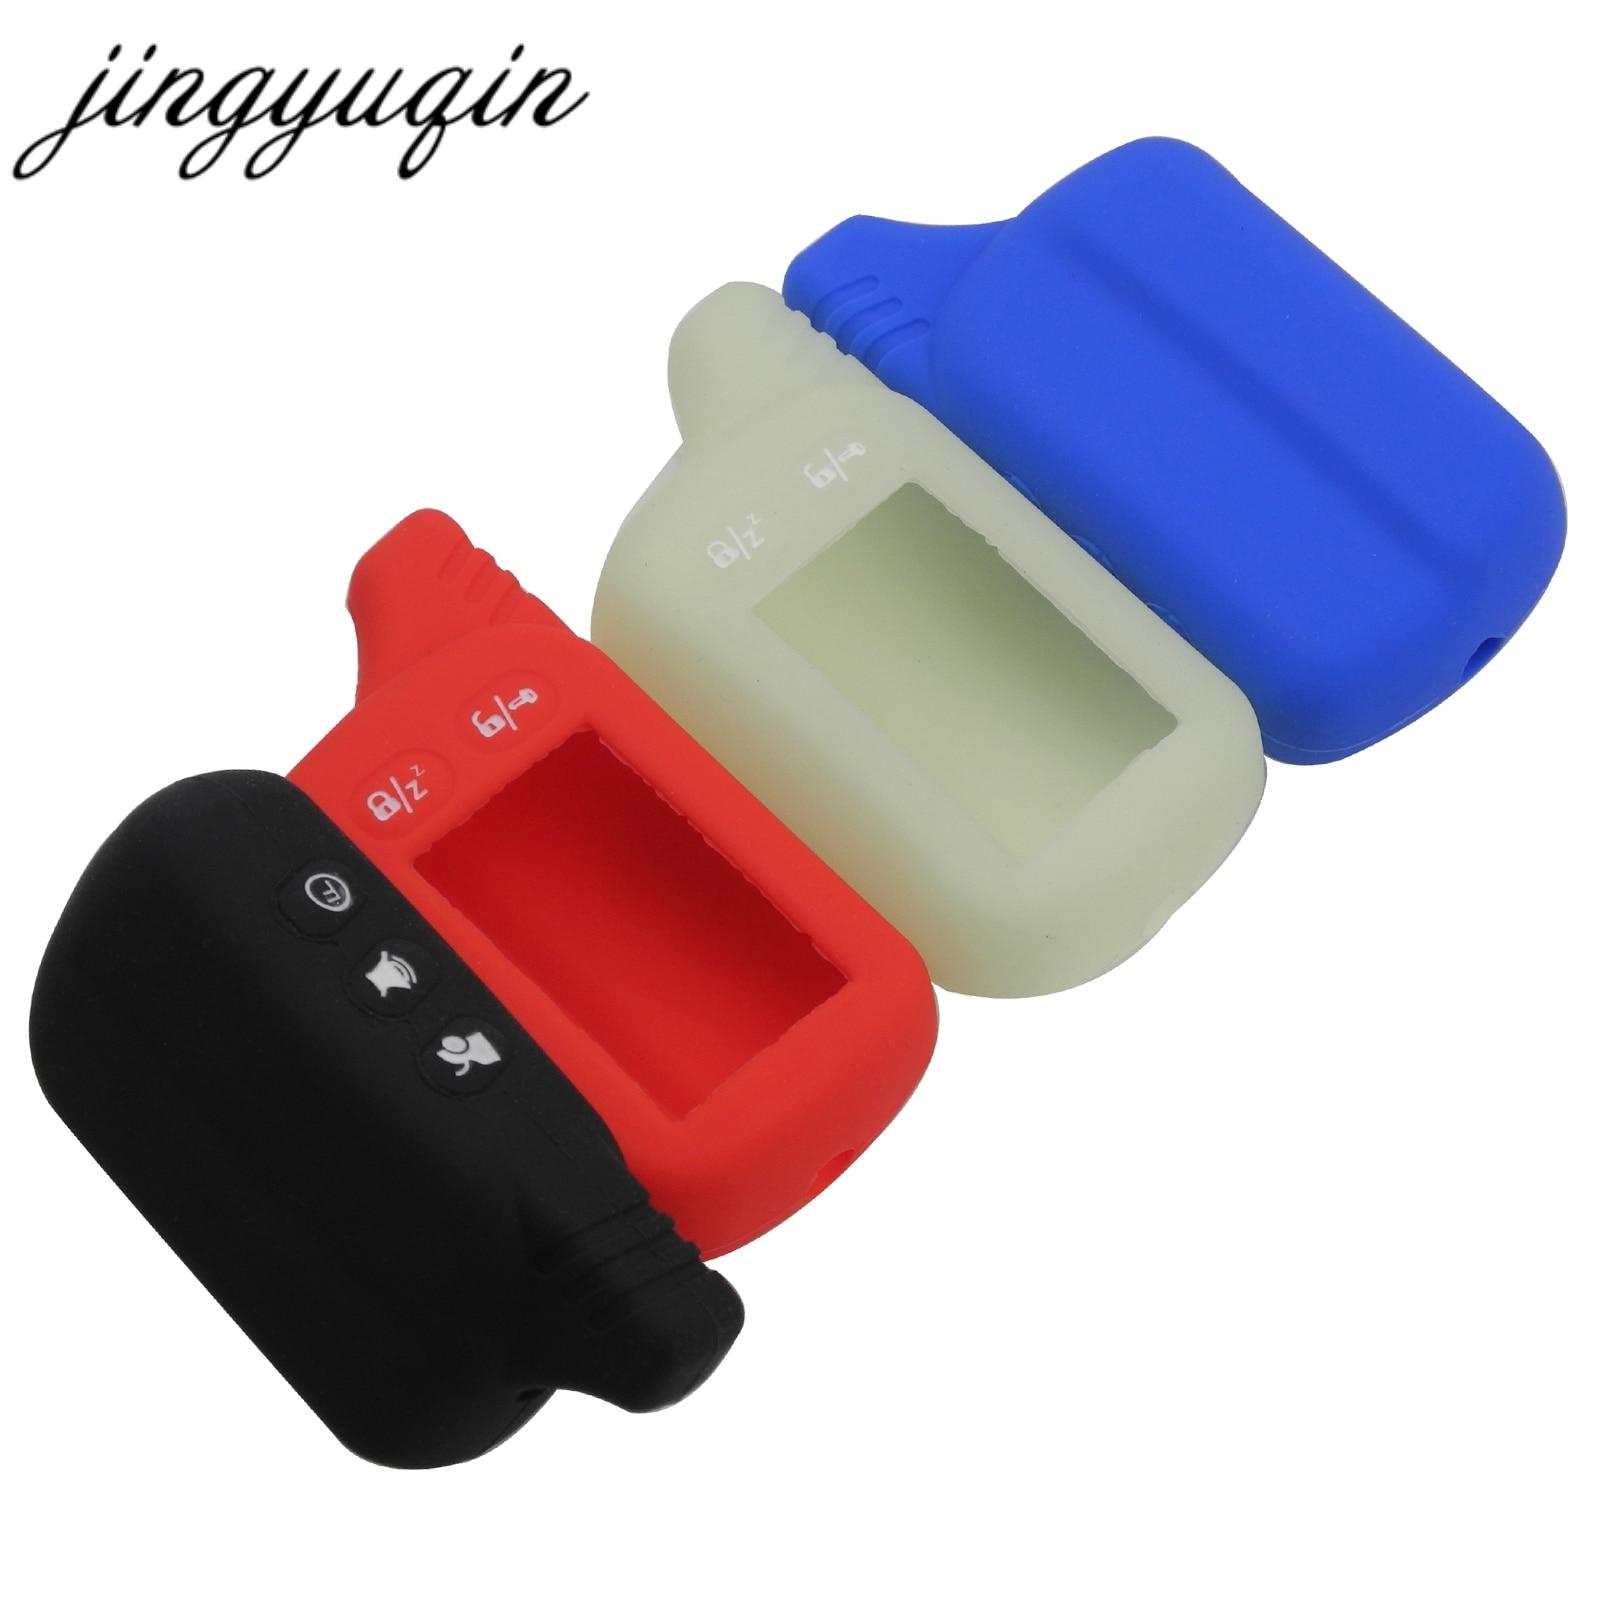 цена на jingyuqin Silicone Case For Tomahawk TZ9030 TZ9020 TZ9031 TZ7010 Scher-khan Two Way Car LCD Alarm Remote Keychain Cover